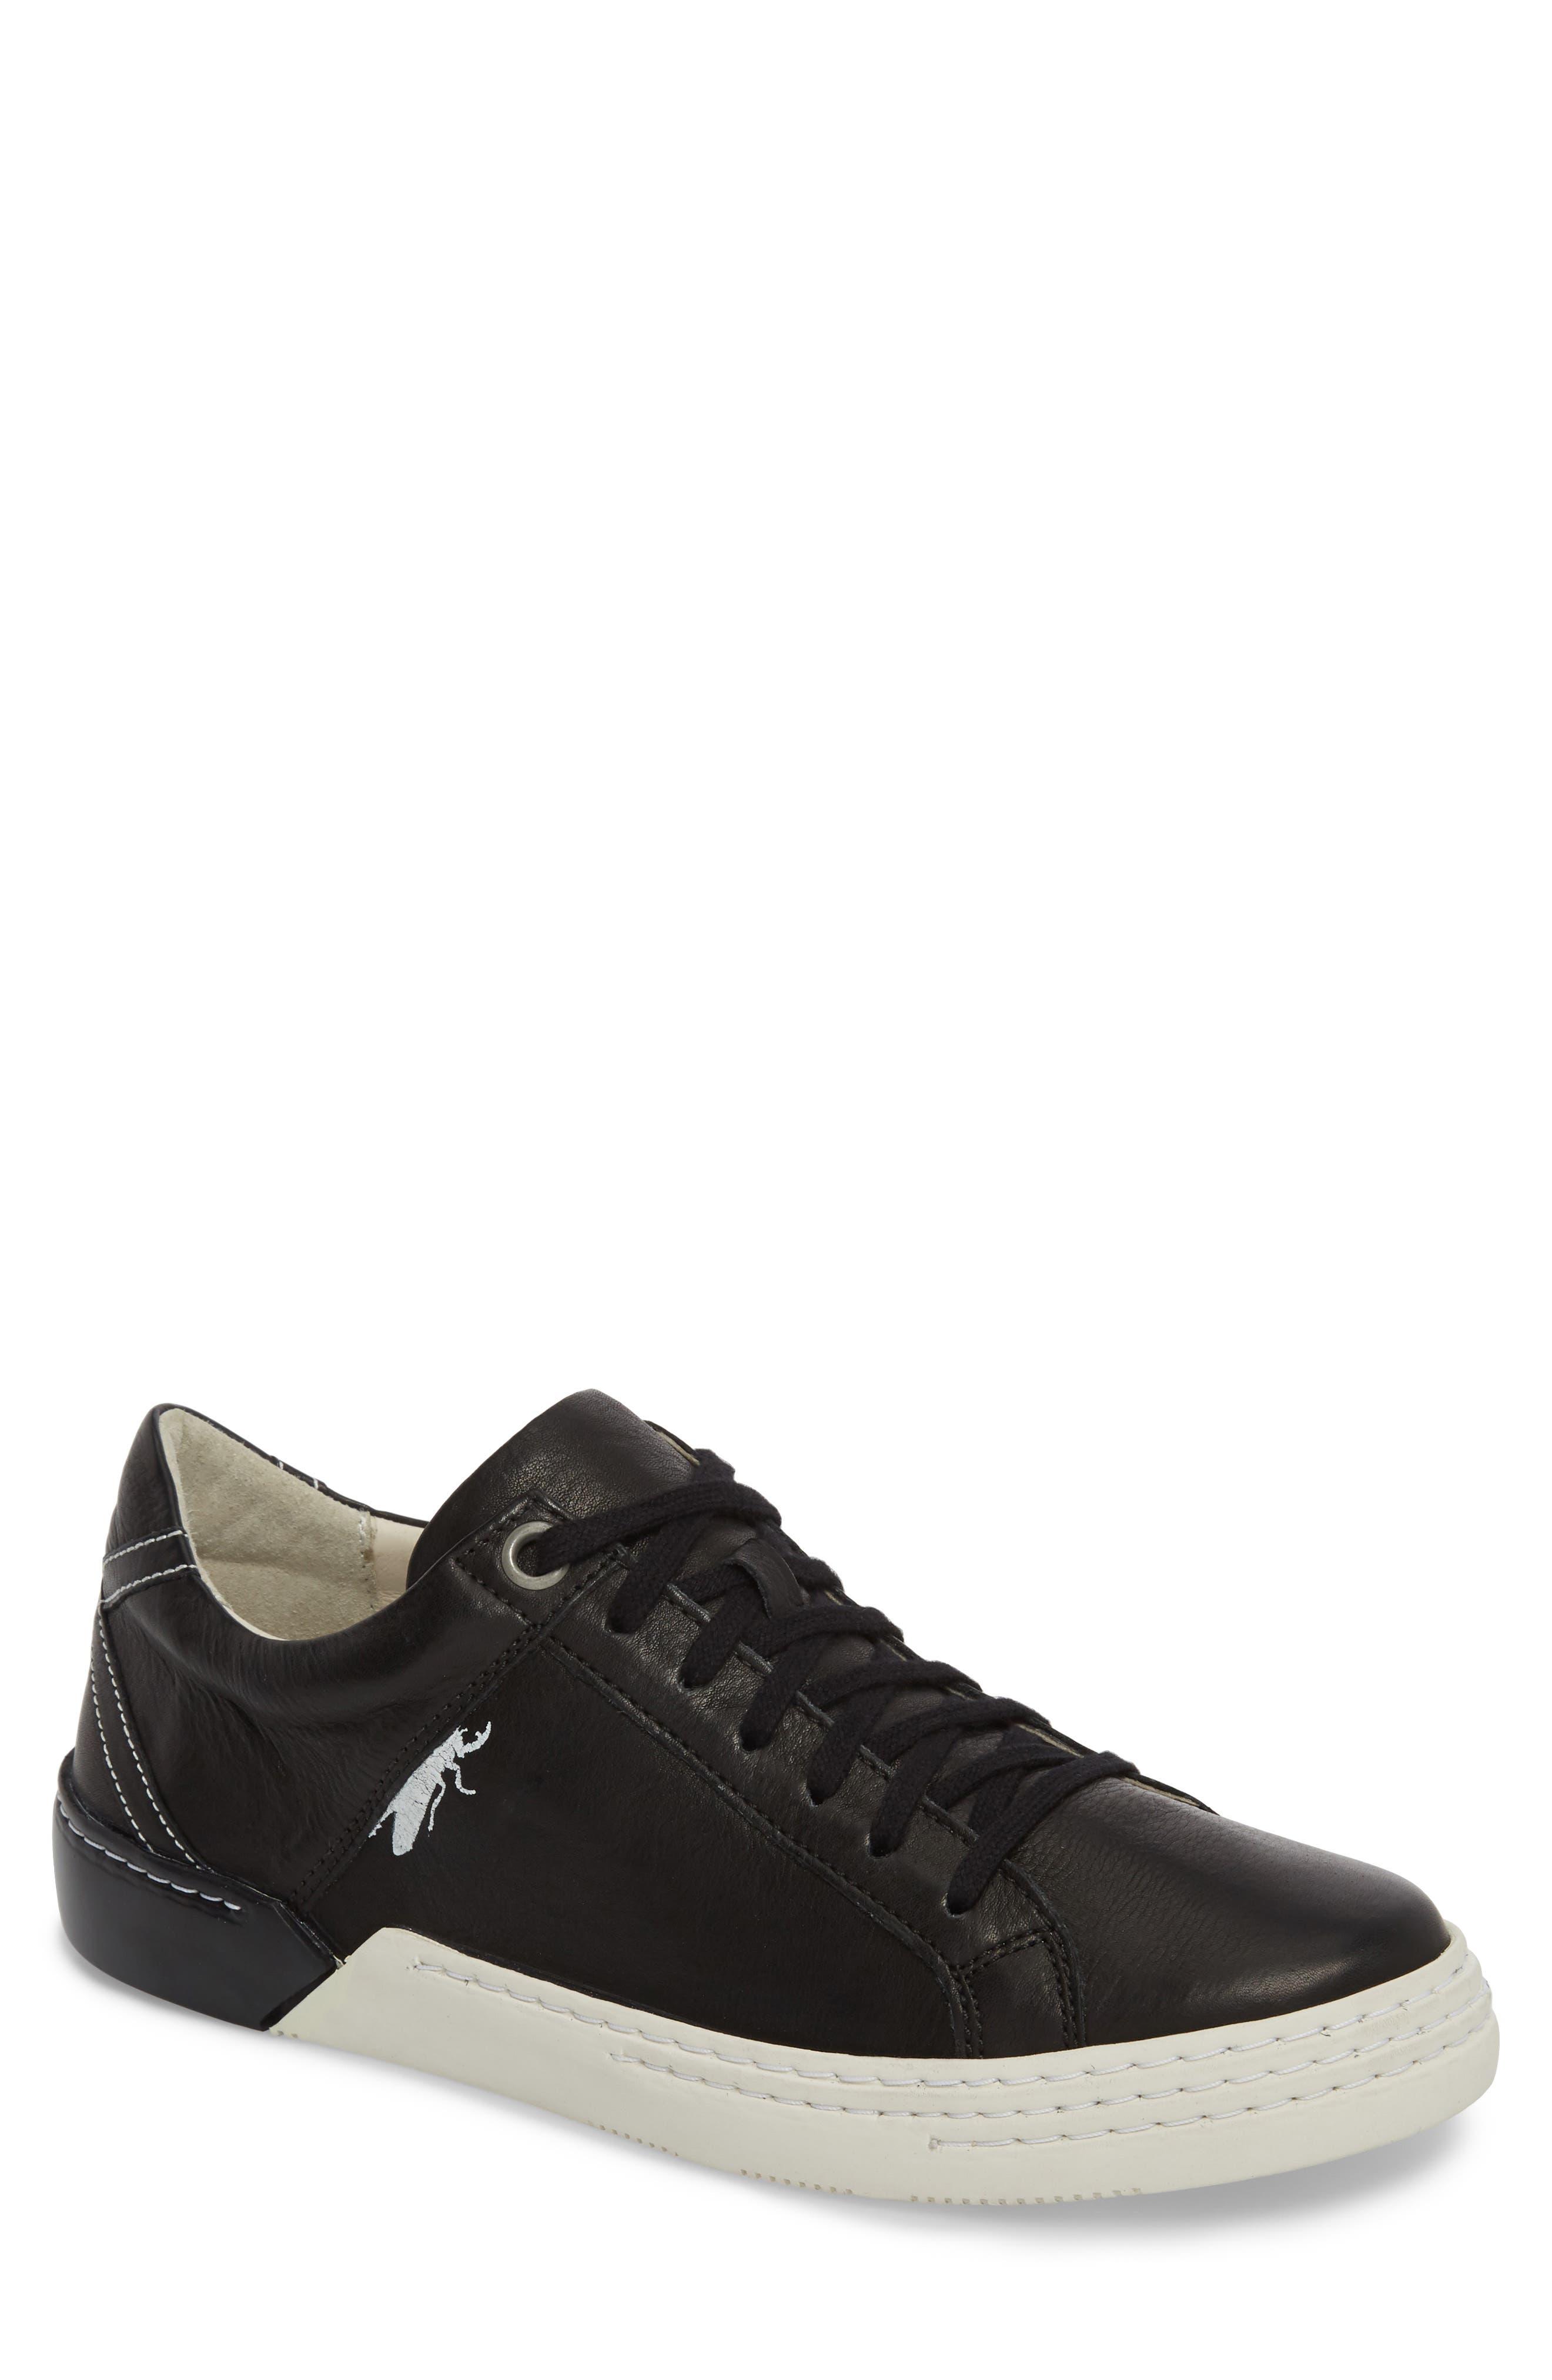 Sene Low Top Sneaker,                             Main thumbnail 1, color,                             BLACK LEATHER